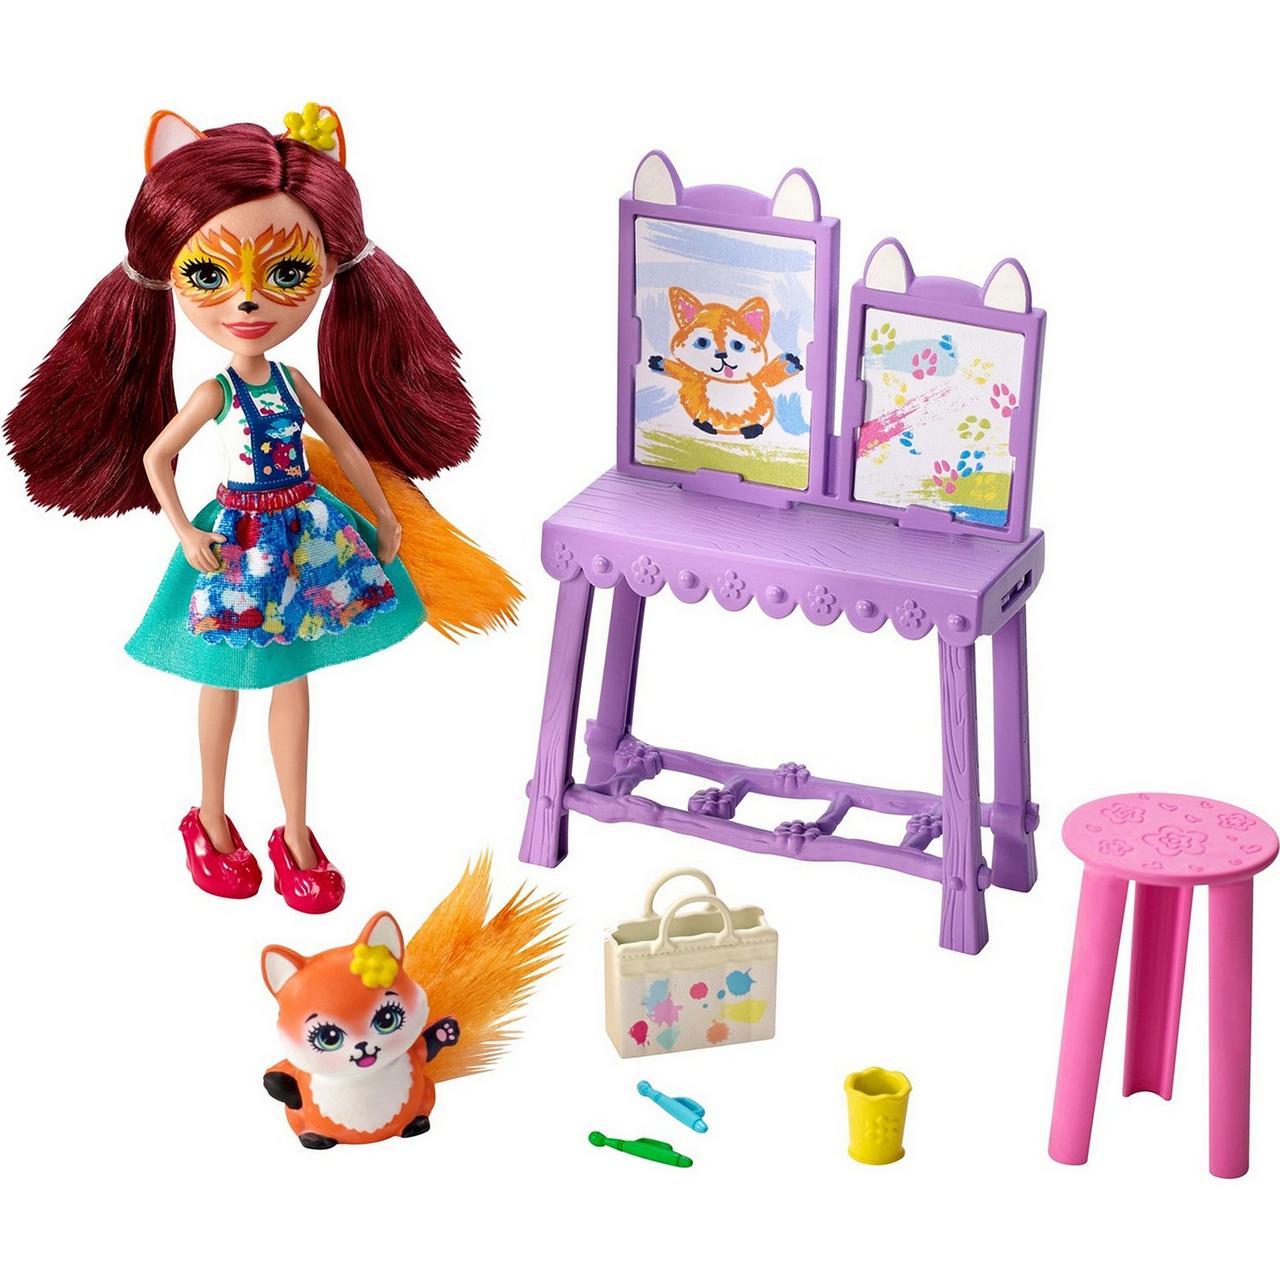 Кукла Enchantimals Энчантималс Художественная студия Лисички Фелисити со зверюшкой GBX03